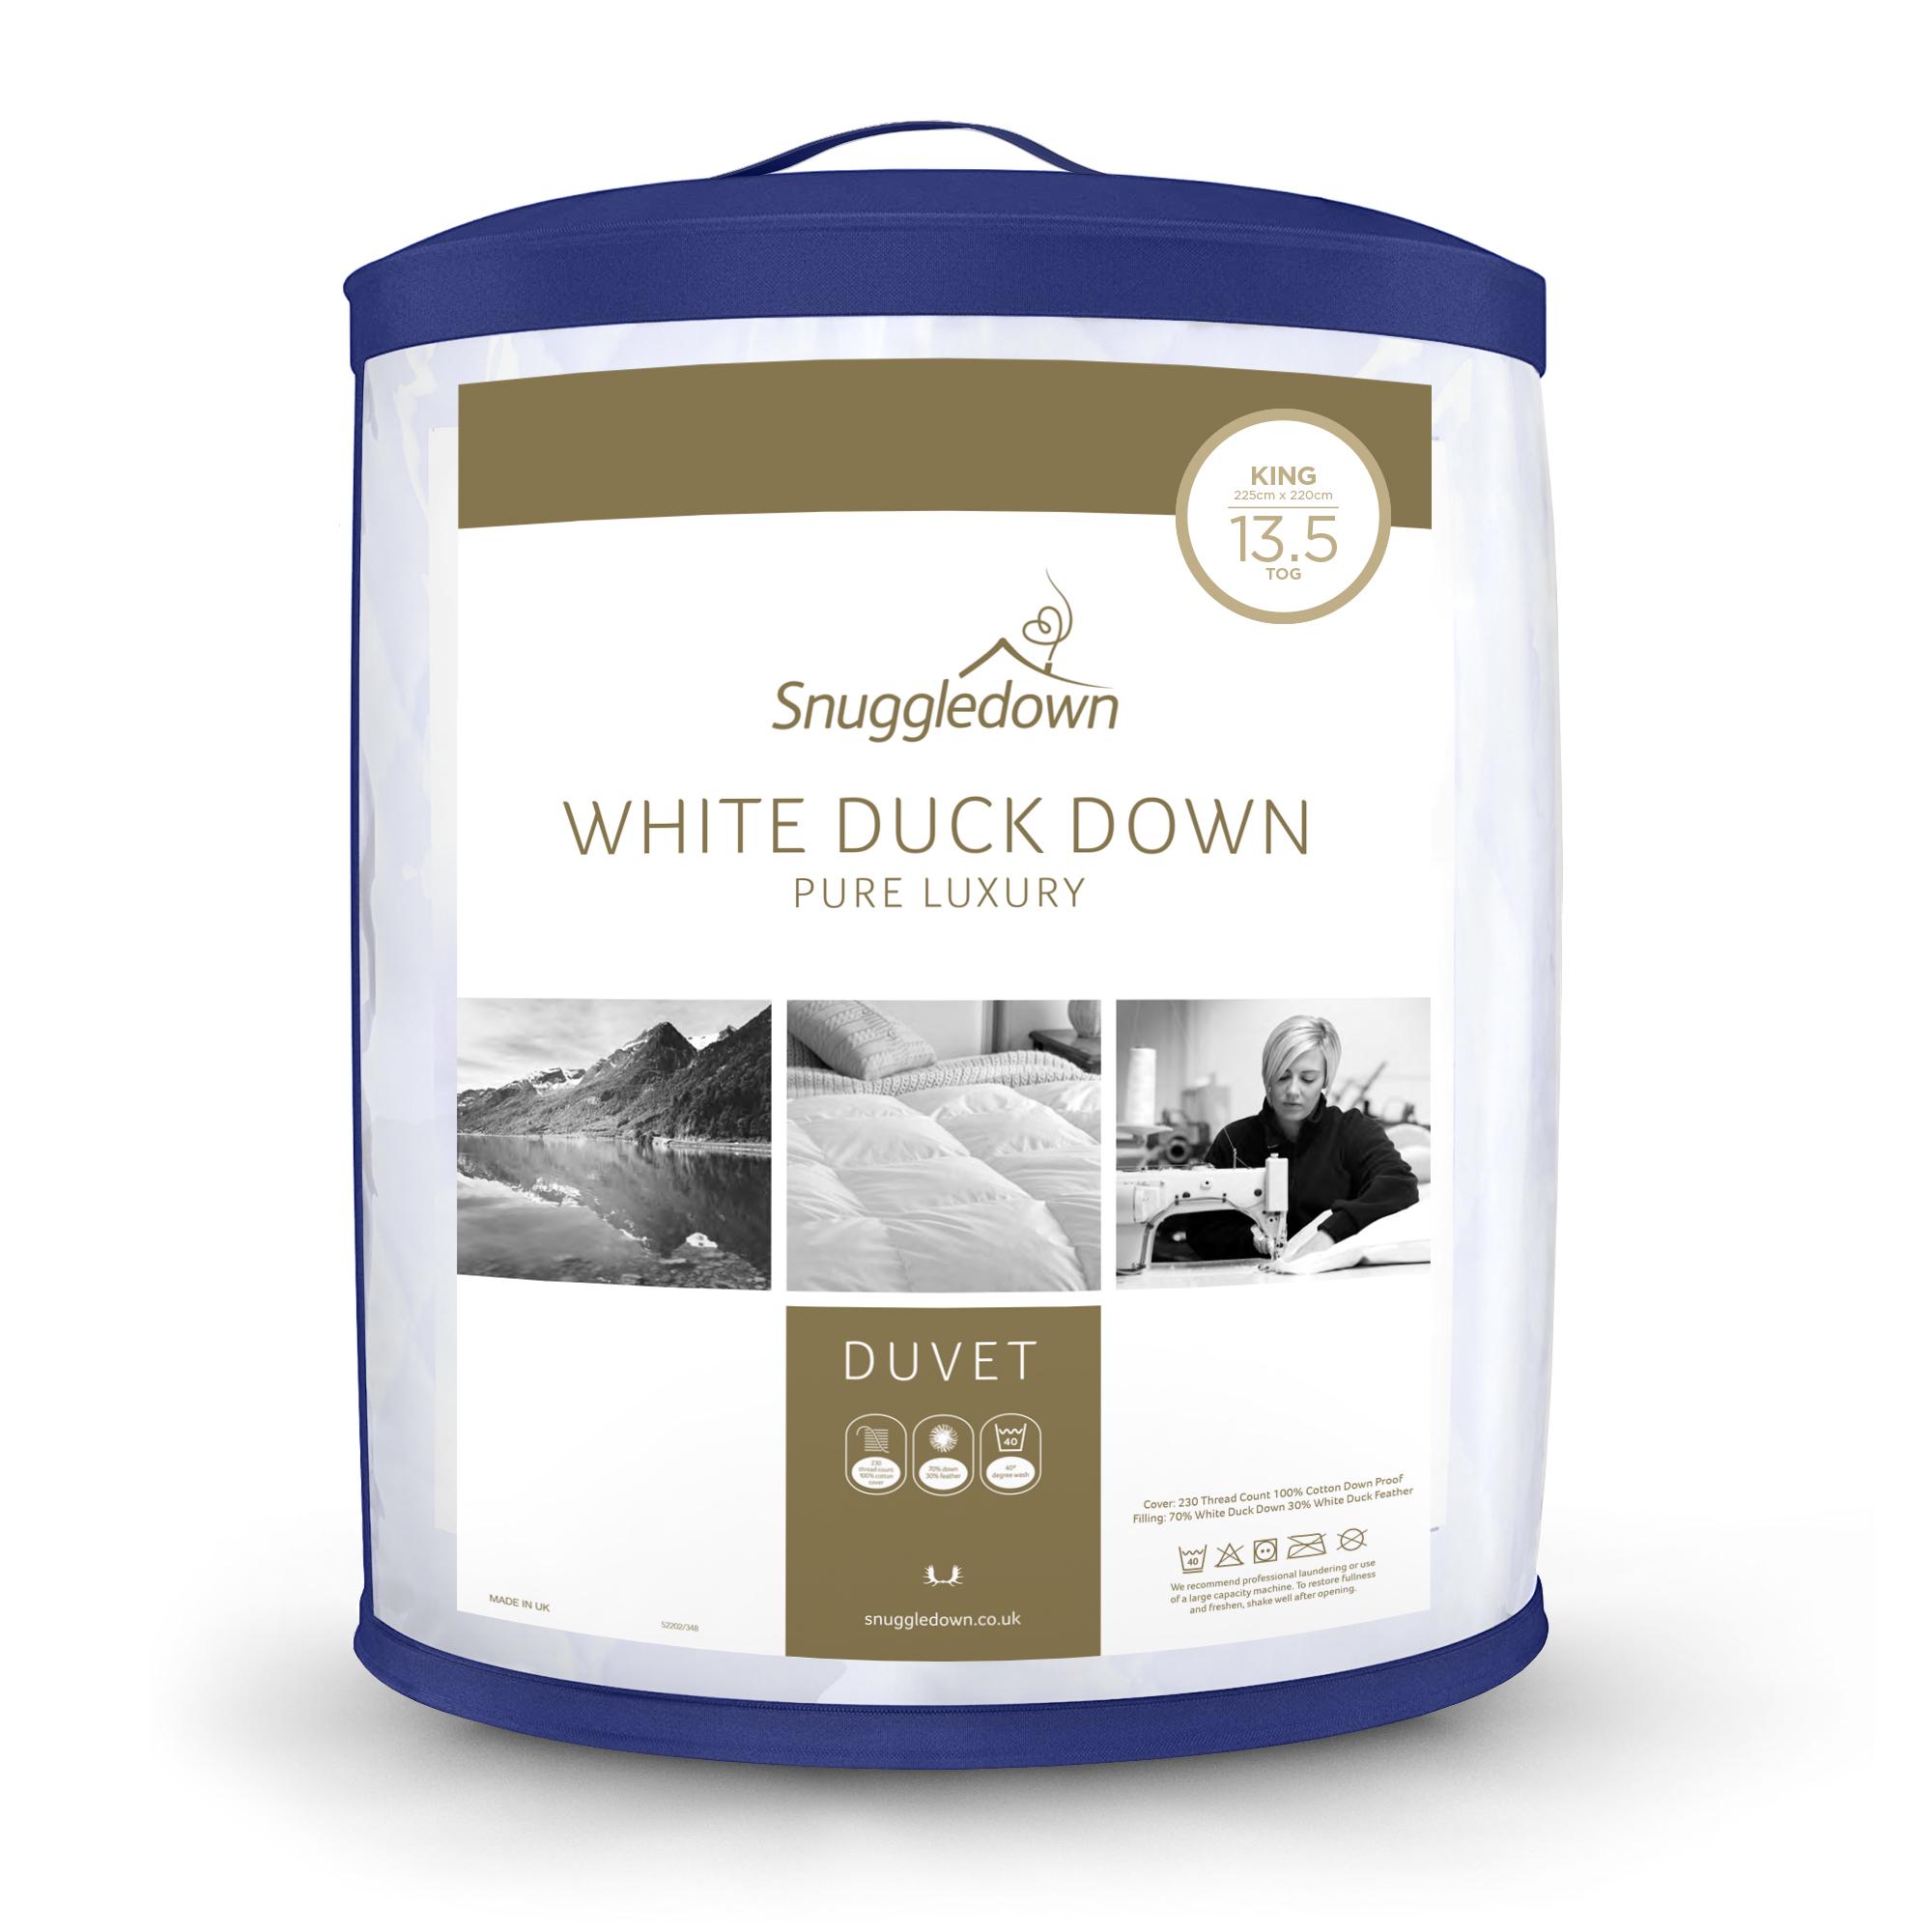 Snuggledown White Duck Down Pure Luxury Duvet